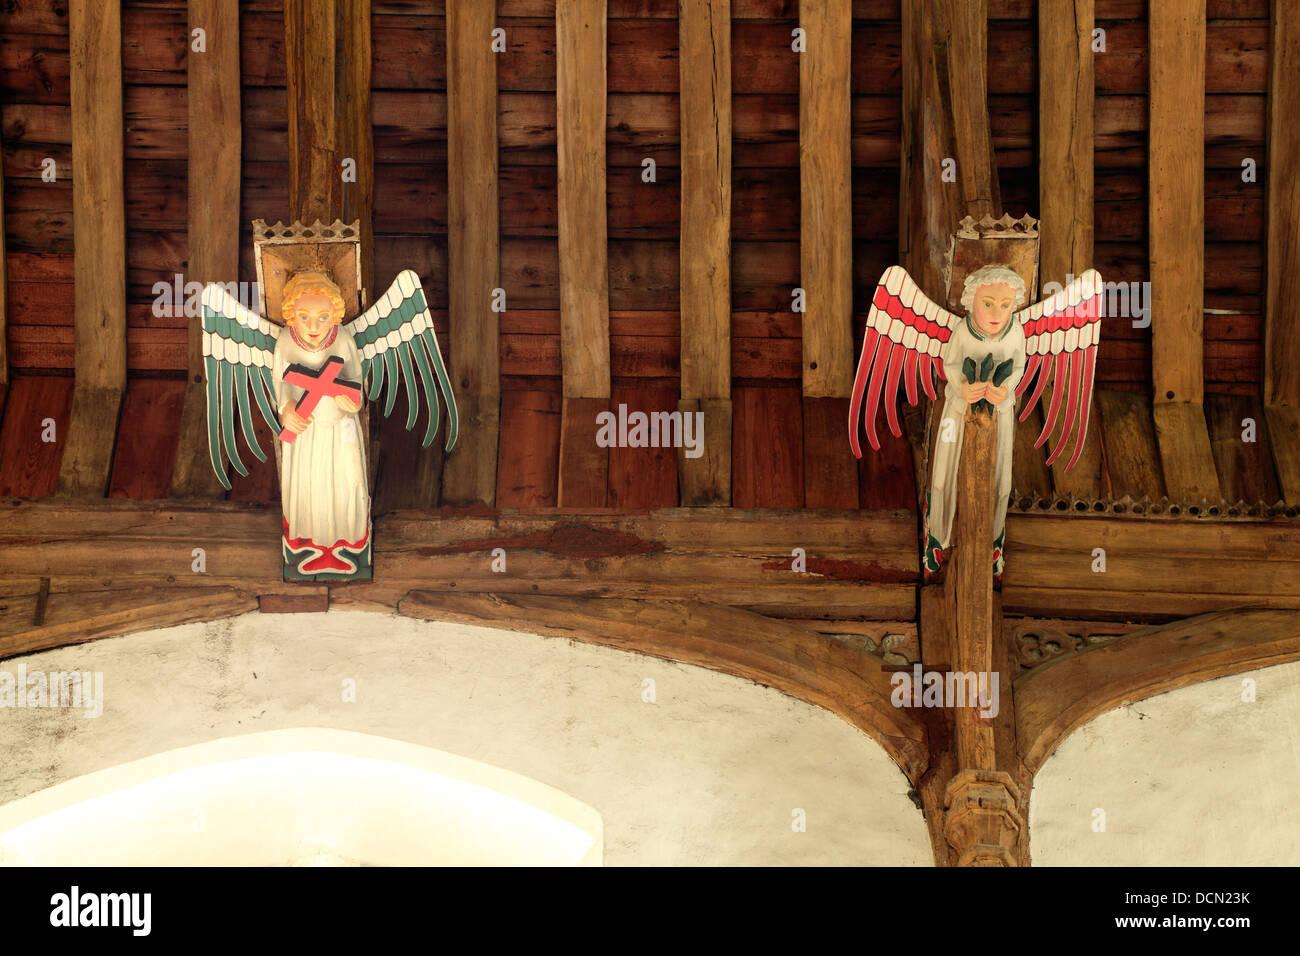 South Creake Kirche, mittelalterliche Hammerbalken Dach, hammer Engel Engel, Norfolk, England, Dächer Beam Stockbild